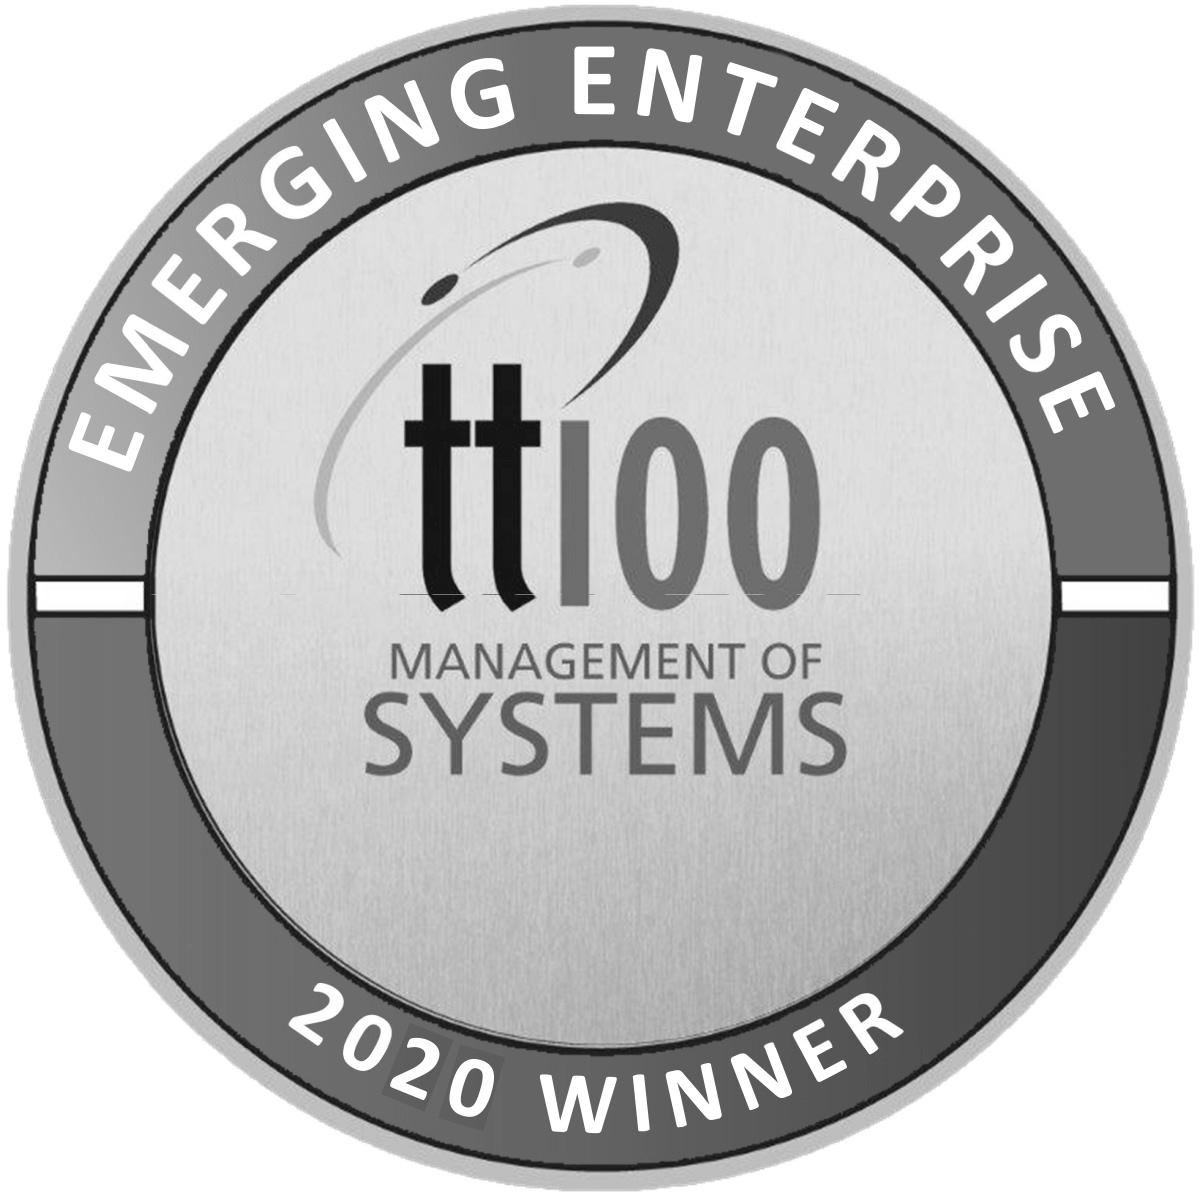 tt100-seal-management-of-systems-2020-winner